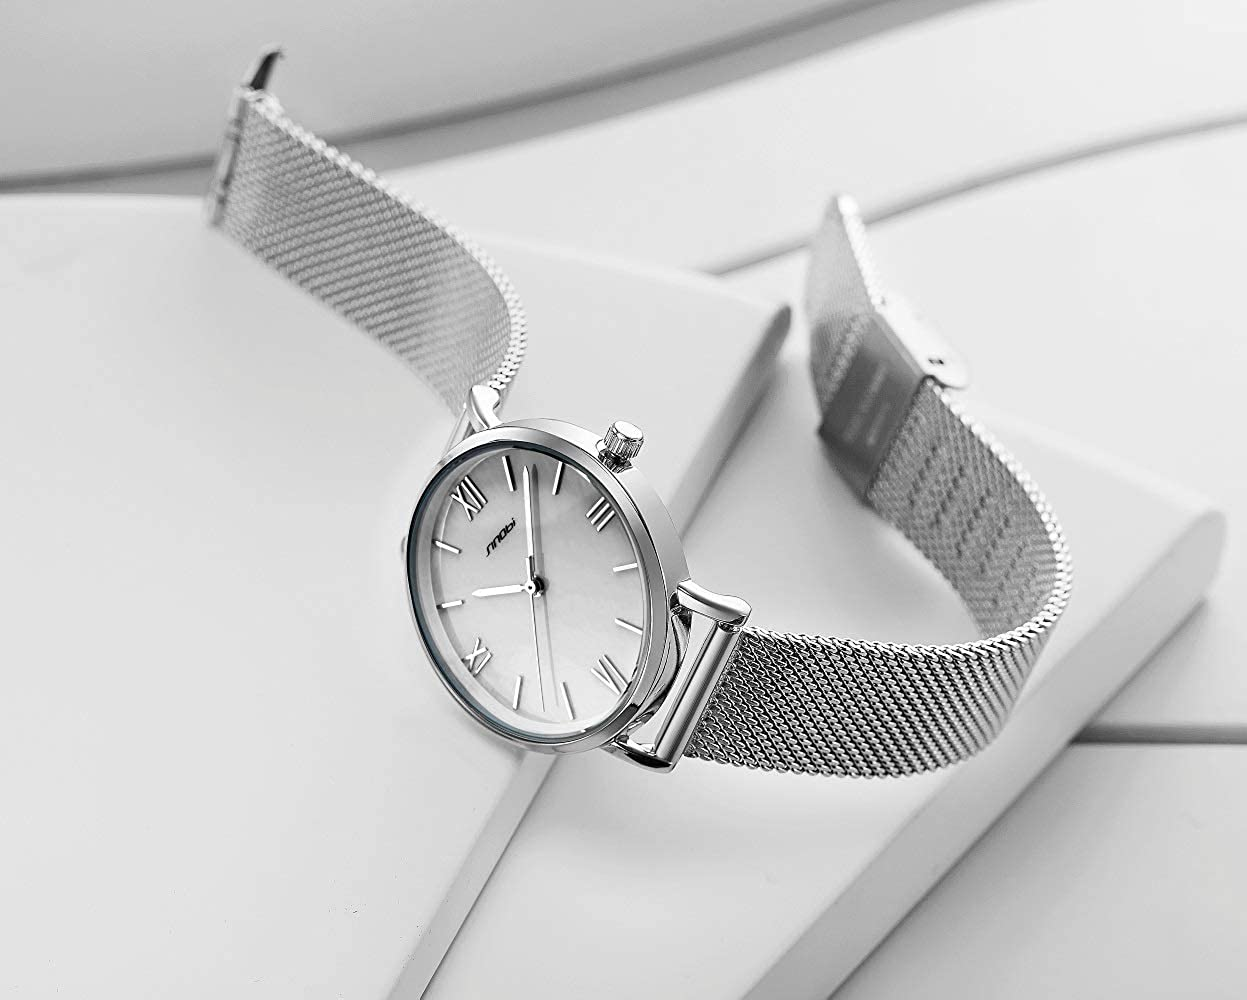 Amazon.com: SINOBI Creative Design Simplicity Women Watch Elegant Diamond Mesh Band Women Watches Ladies Wristwatch (S9709L-Silver-Shell Dial): Watches